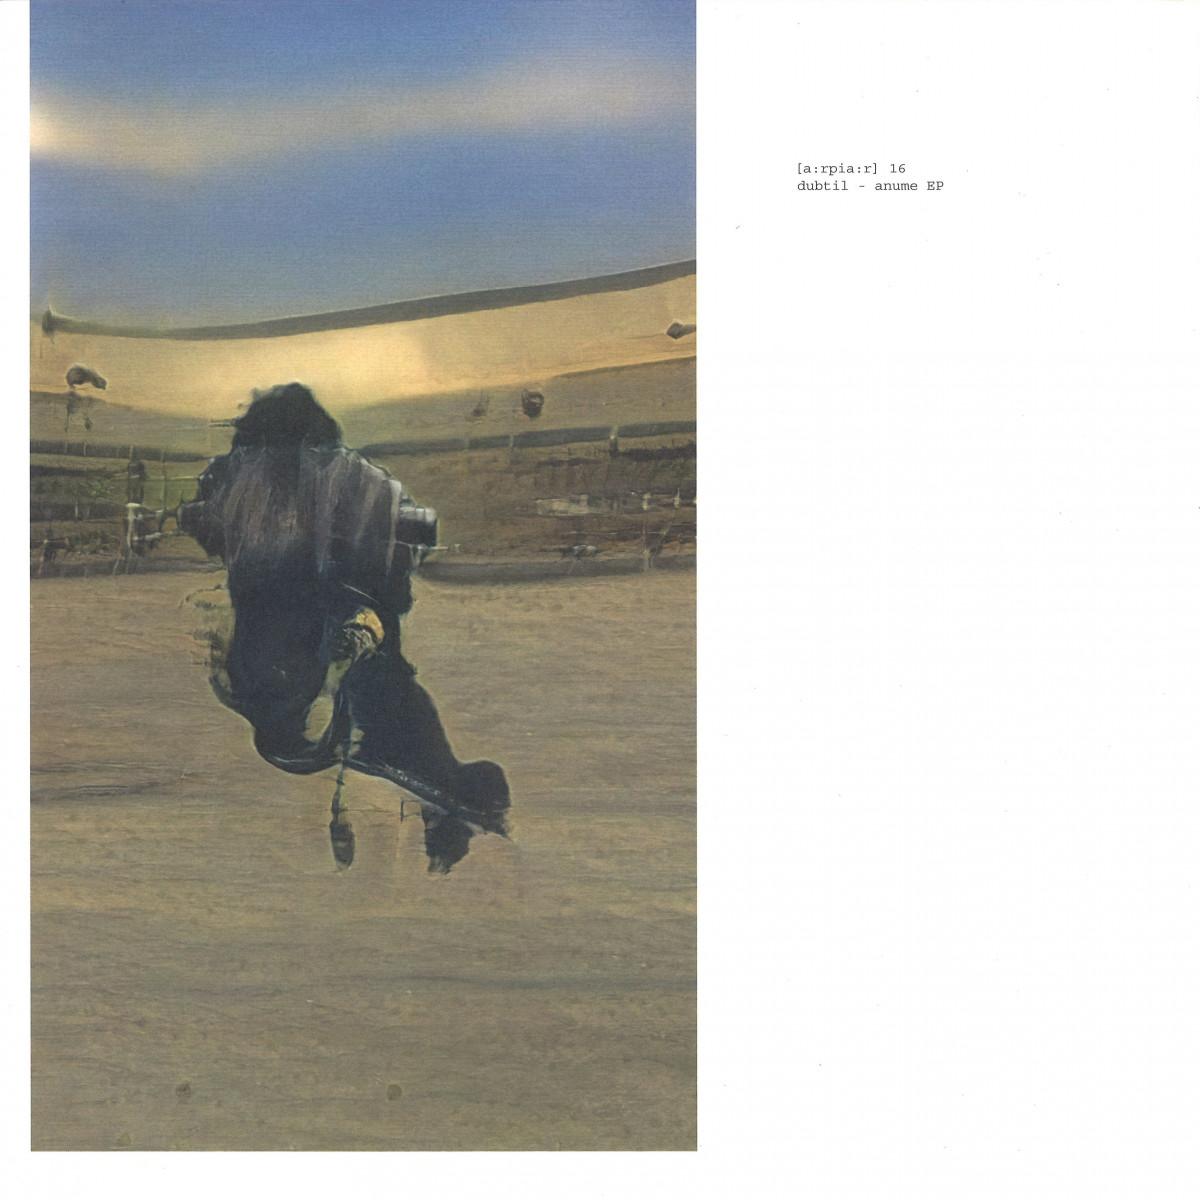 Dubtil - Anume EP [a:rpia:r]